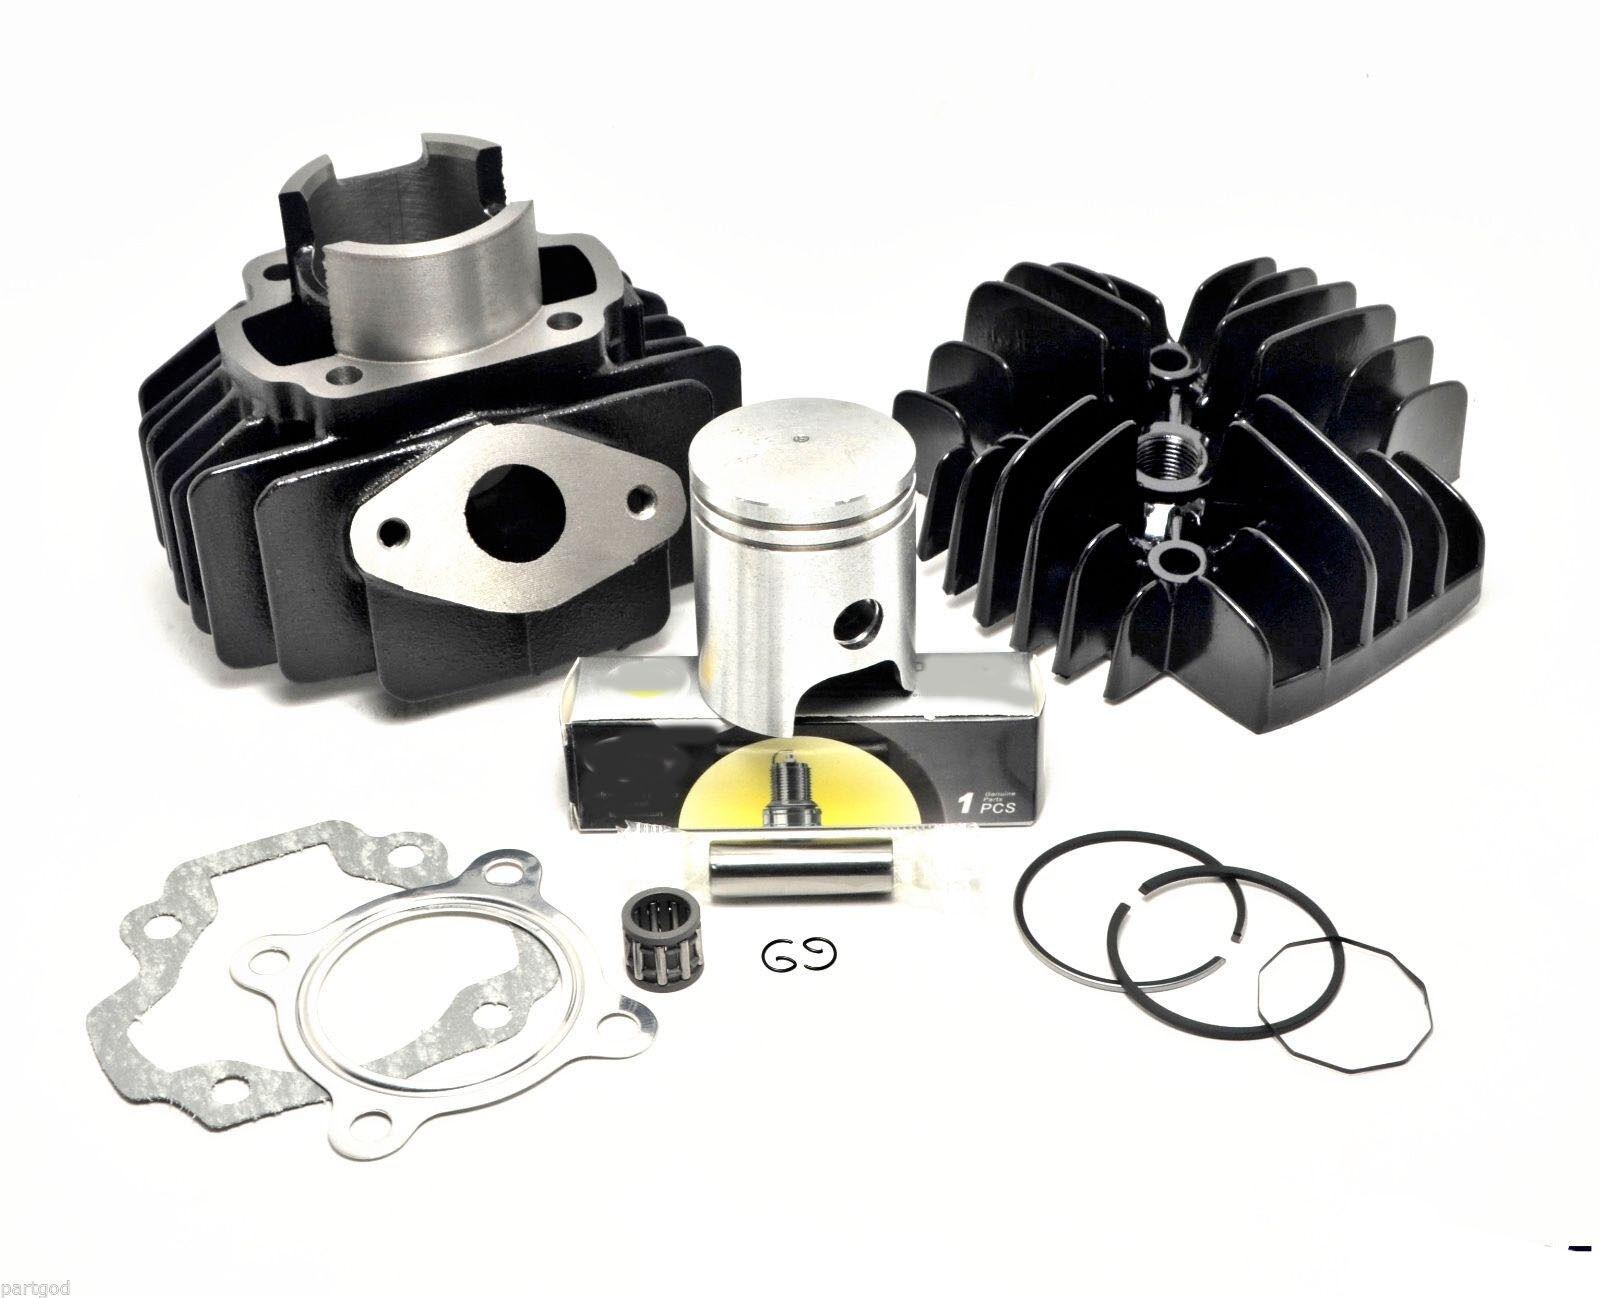 PW50 Kit de Anillo de Pistón  Cabeza Junta De Cilindro Para Yamaha PW50 Qt 50 QT50 1981-2009  70% de descuento